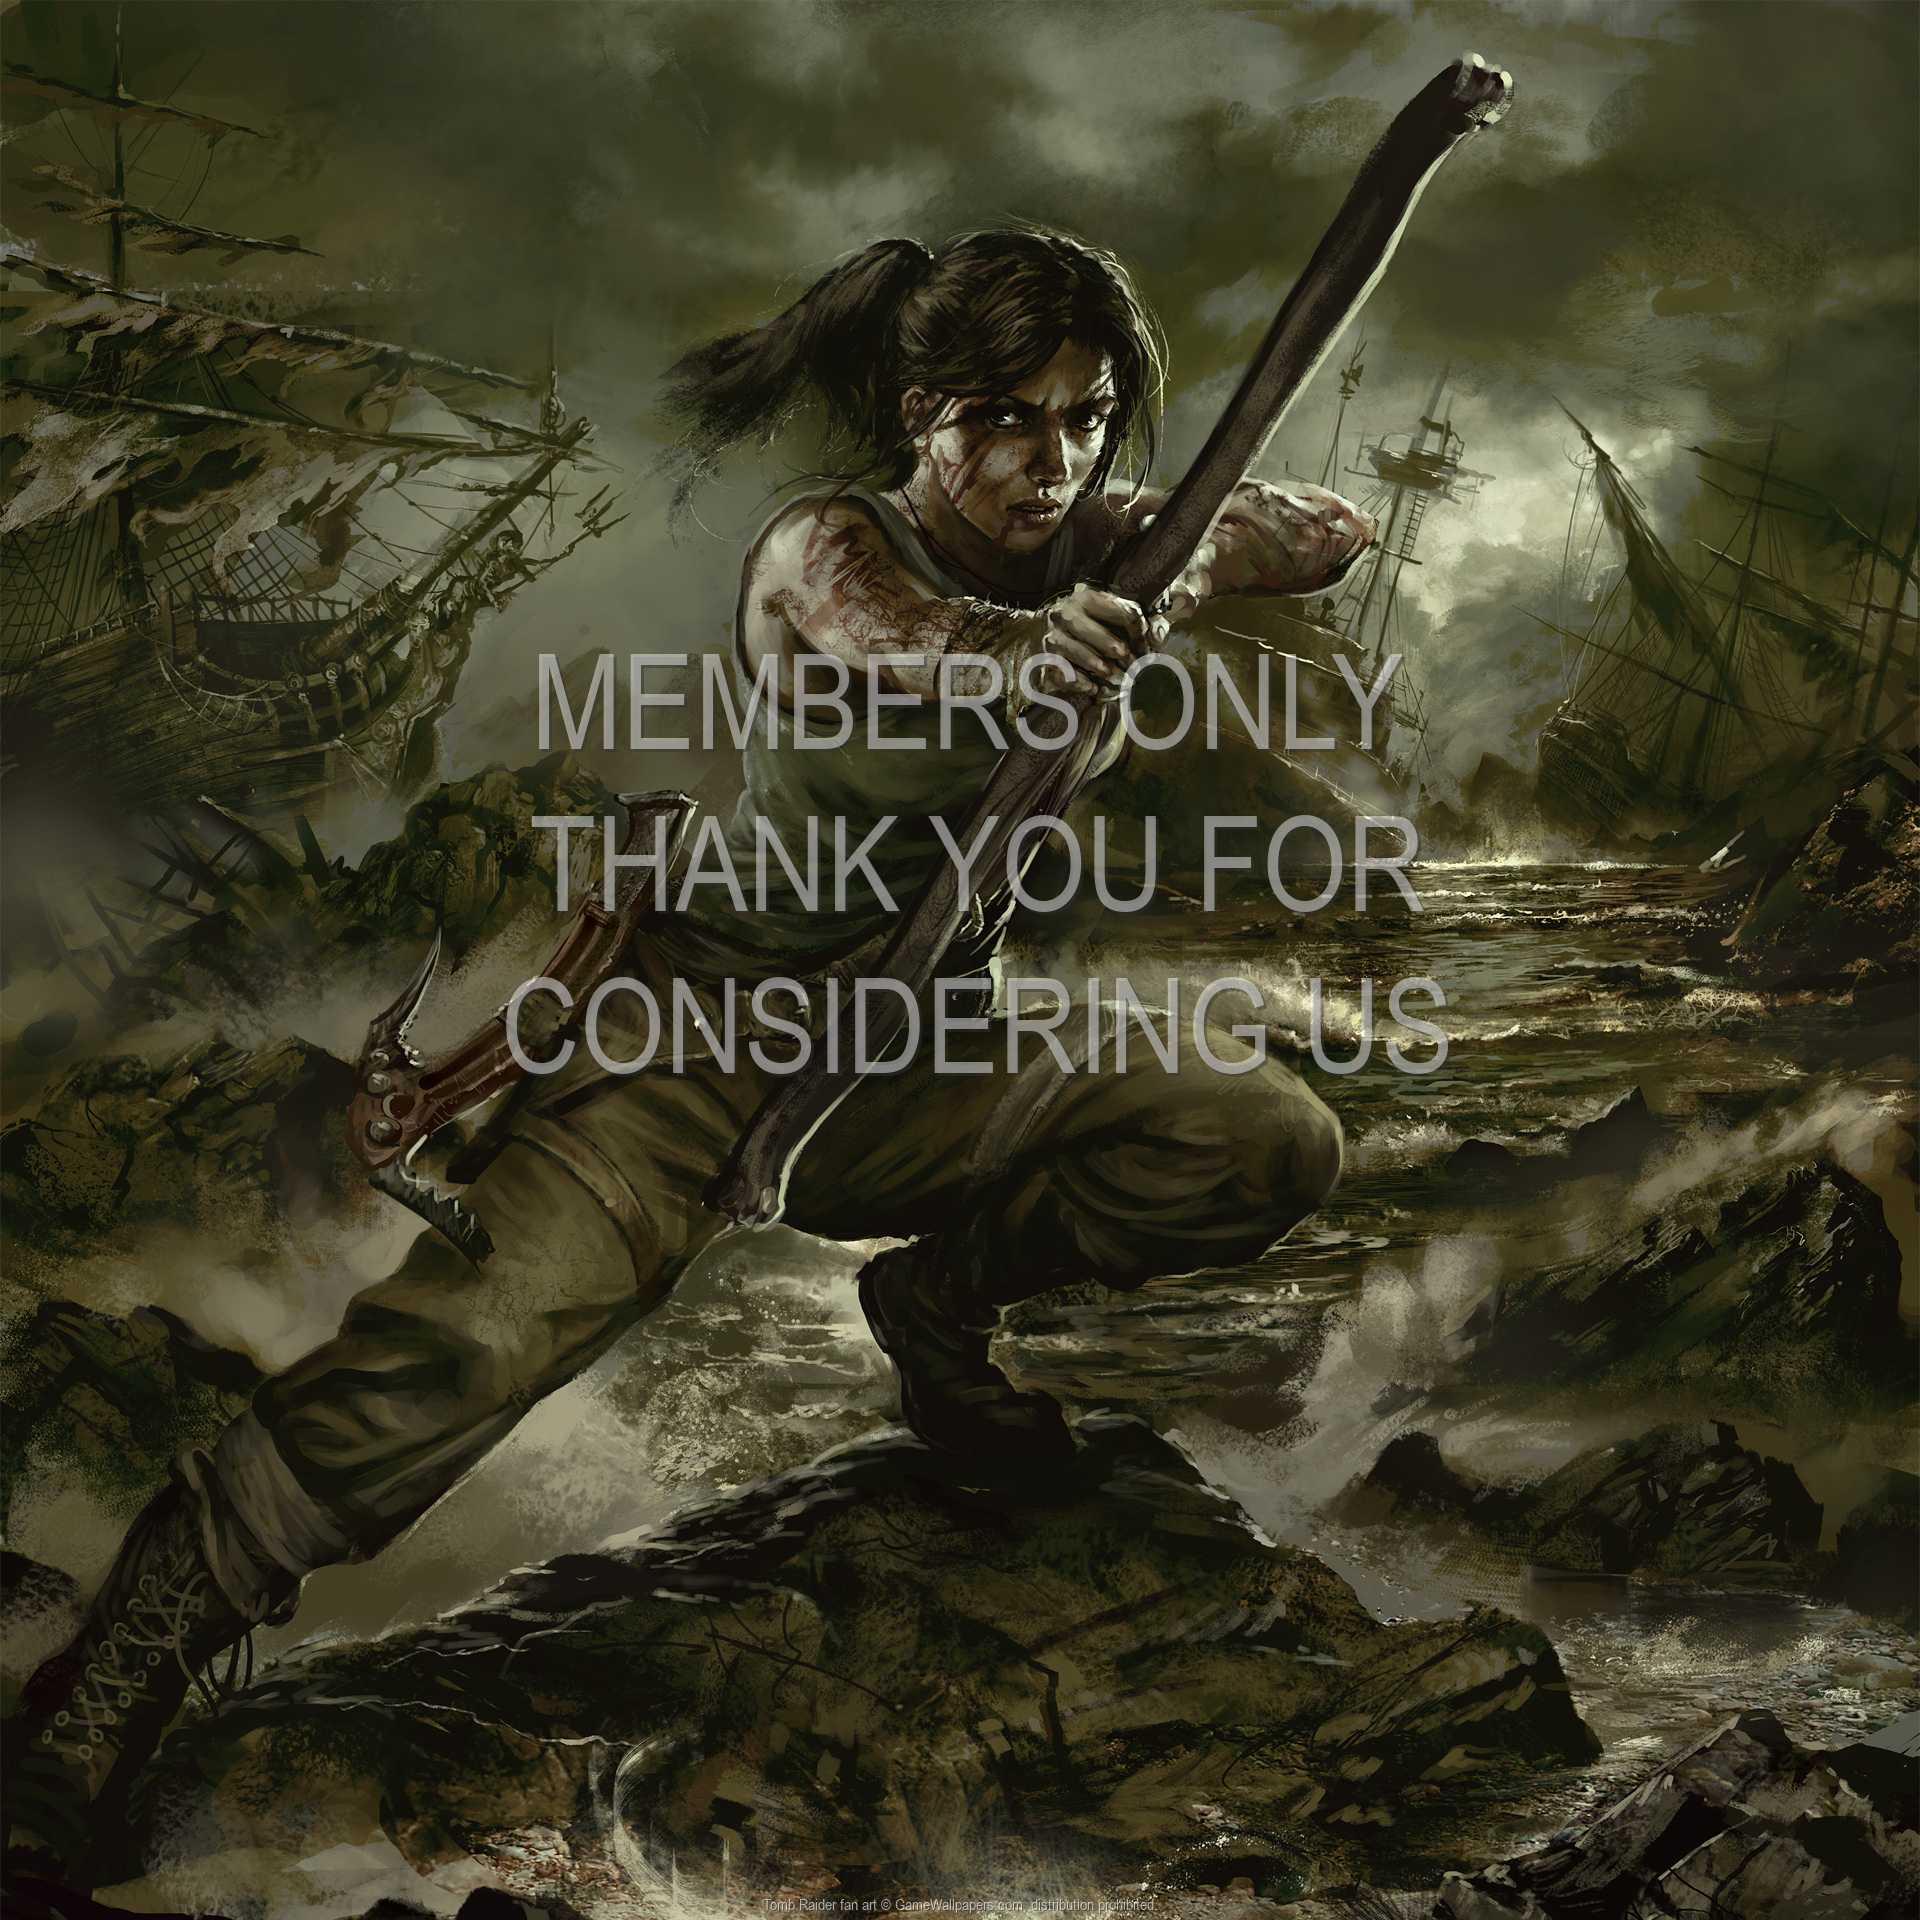 Tomb Raider fan art 1080p Horizontal Handy Hintergrundbild 08